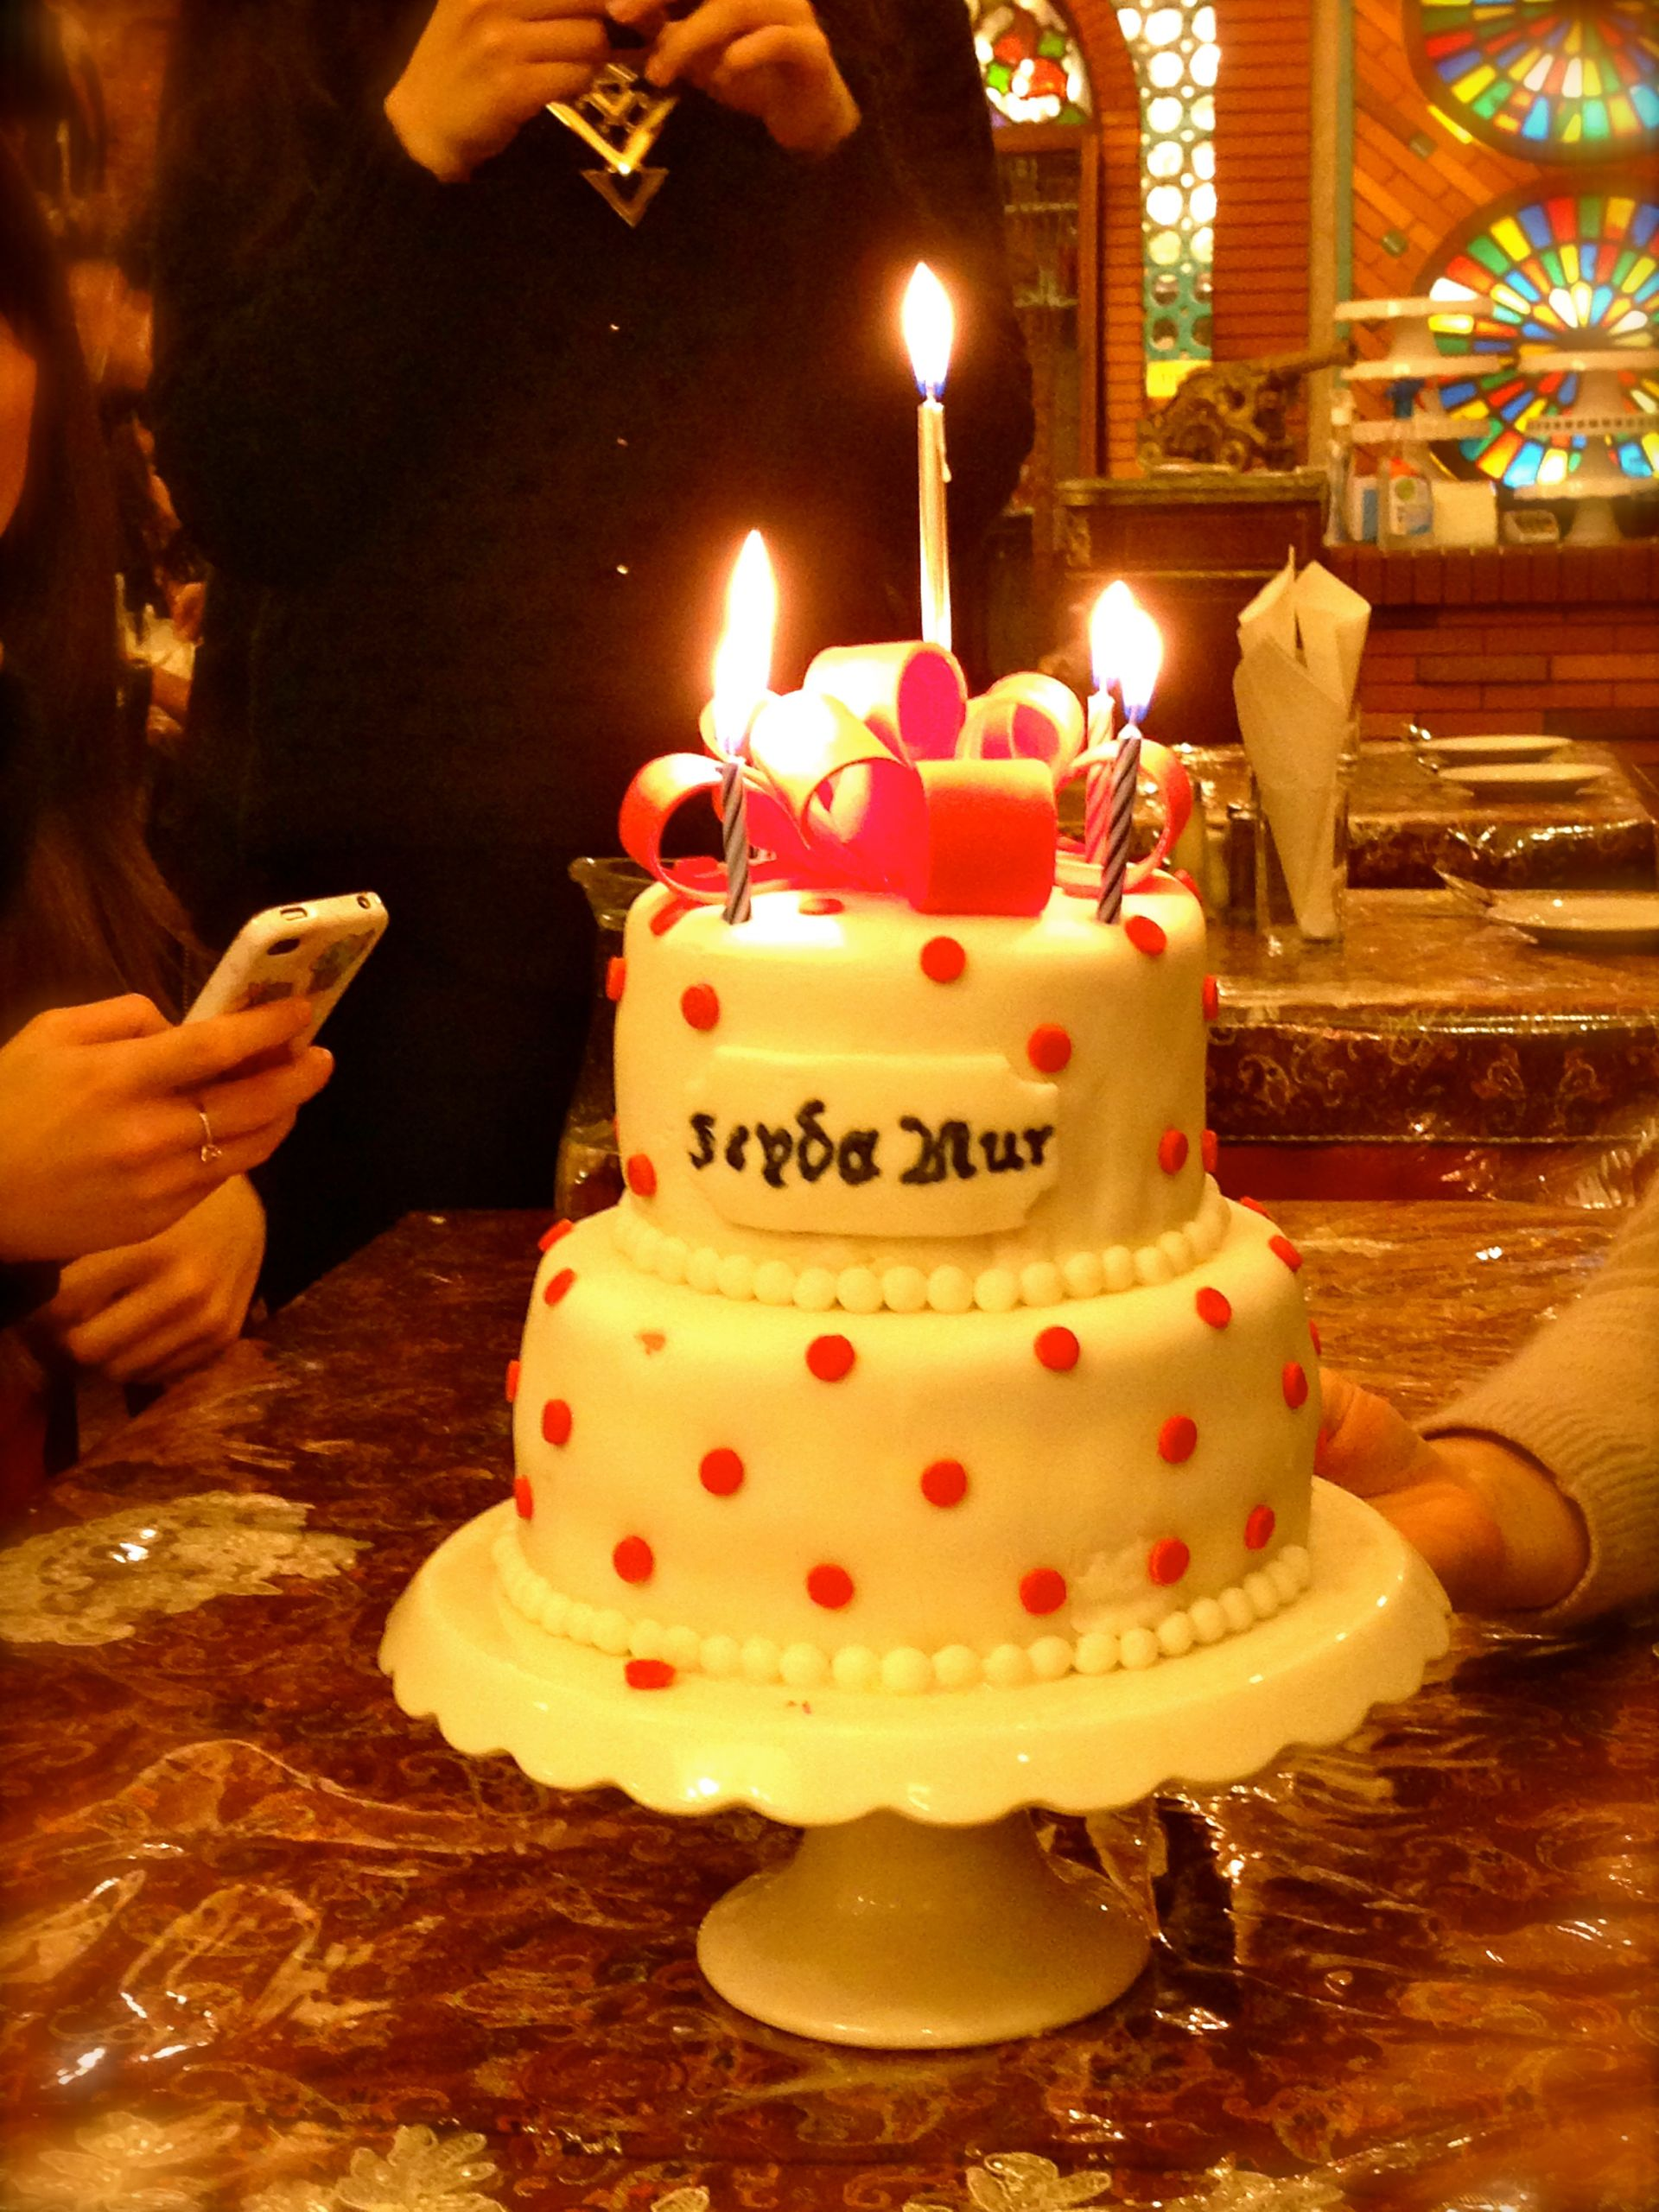 20 Birthday Cake  Seyda Nur's 20th Birthday Cake